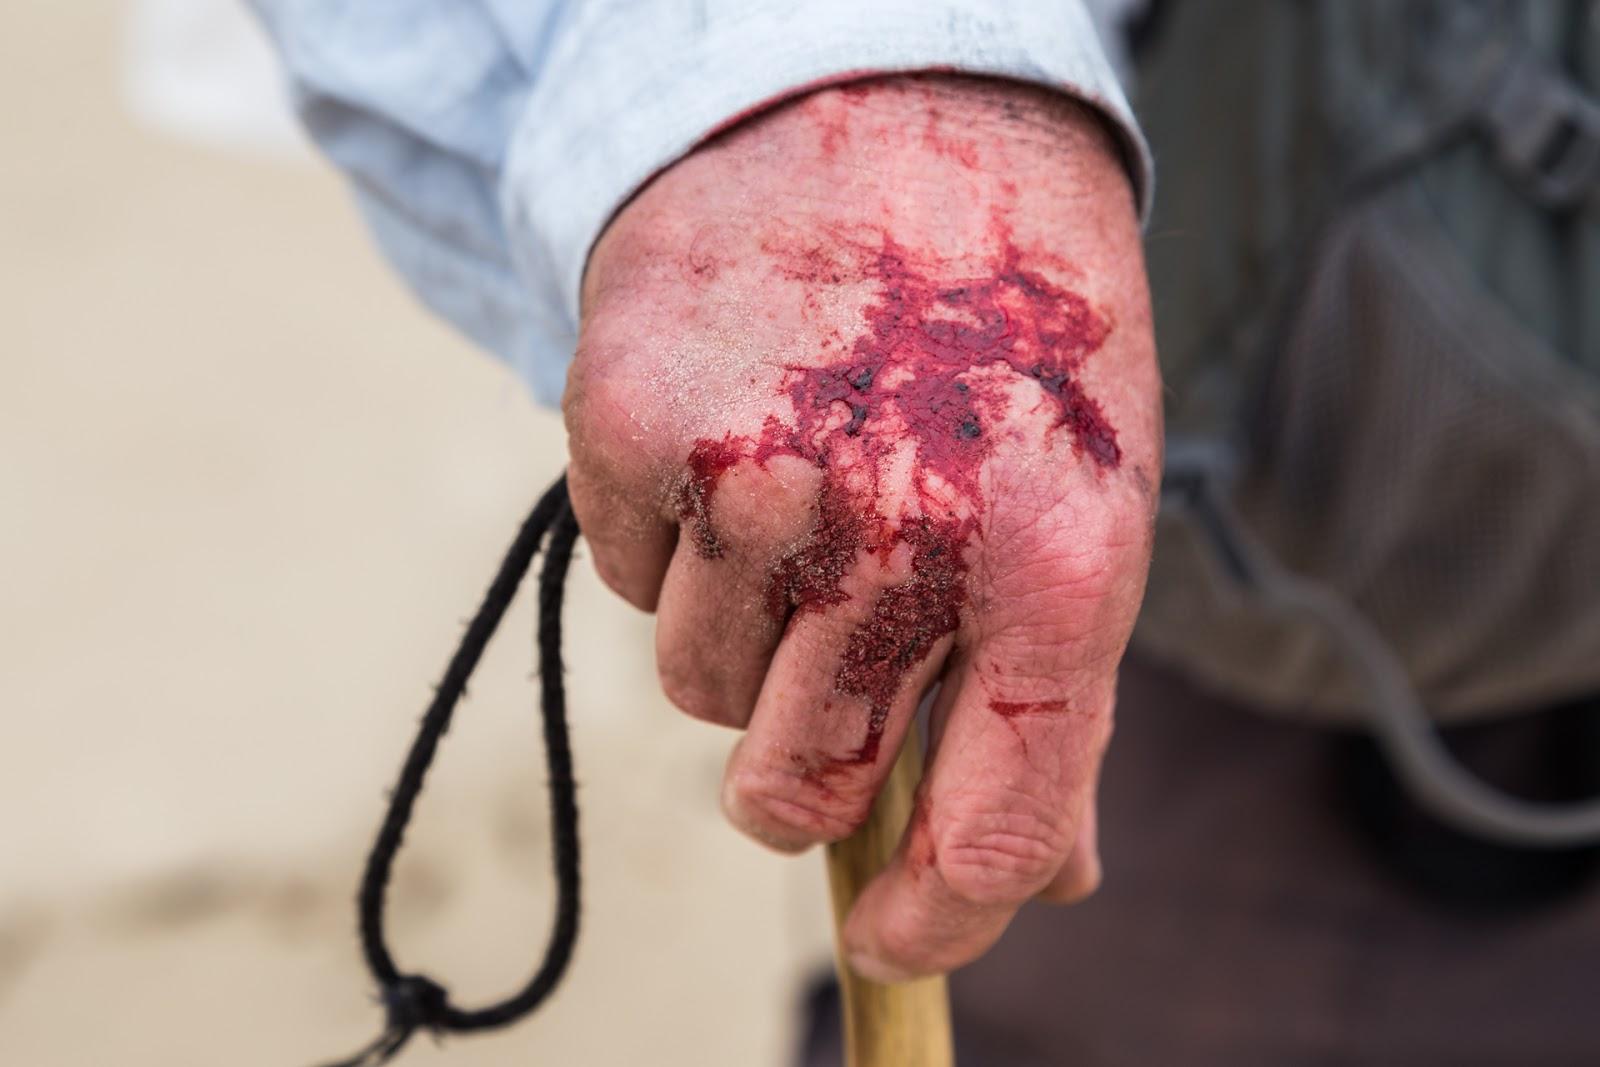 bleeding hand from hiking